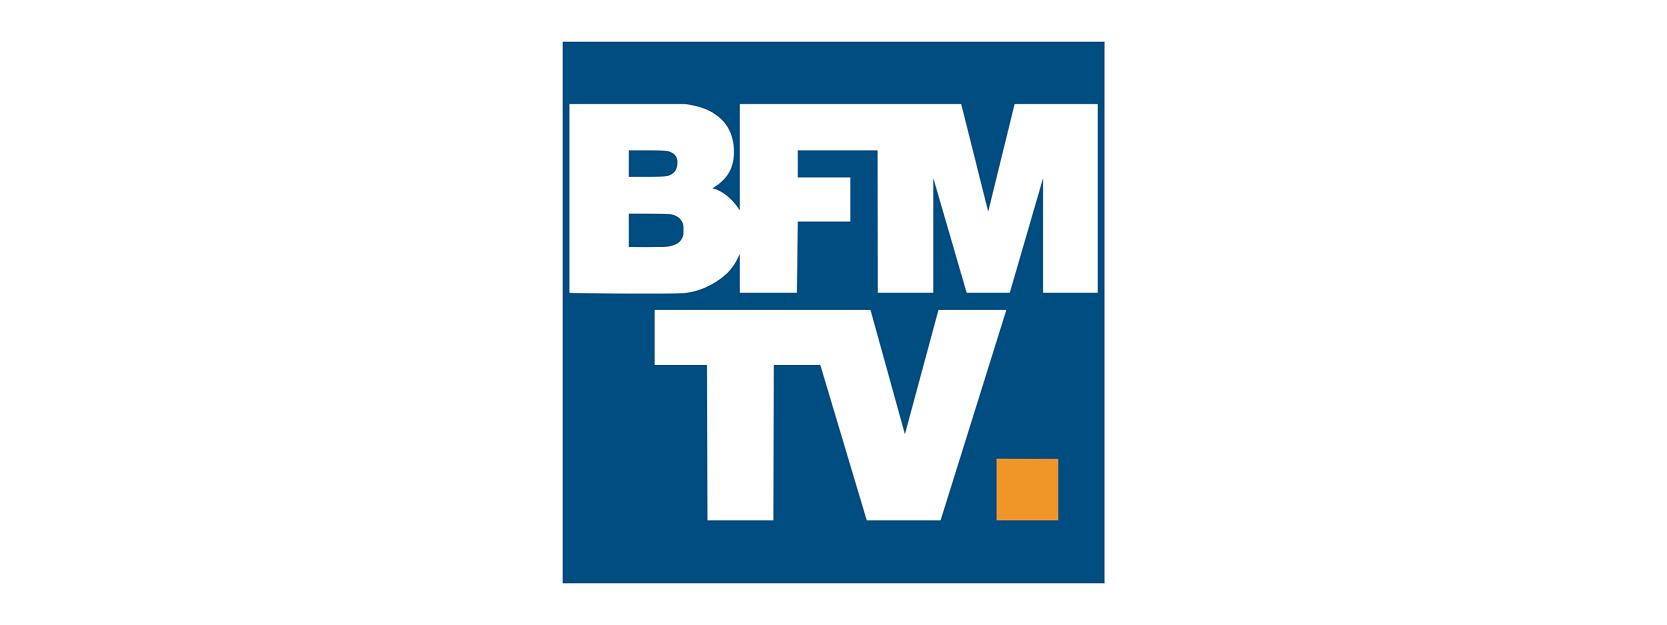 bfm tv site de rencontres